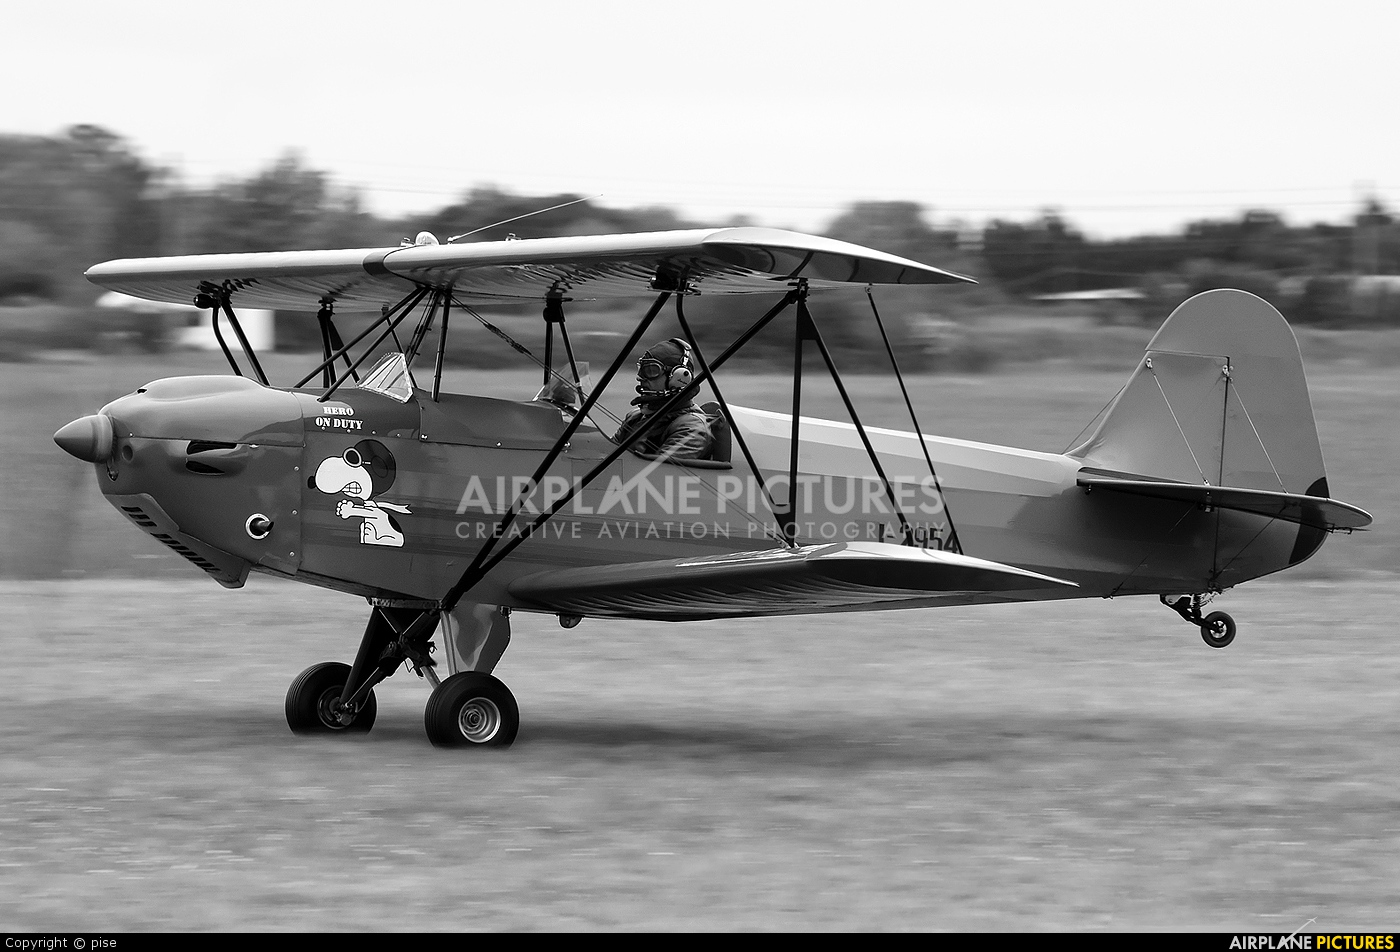 Fisher Celebrity Structural Failure During Aerobatics ...